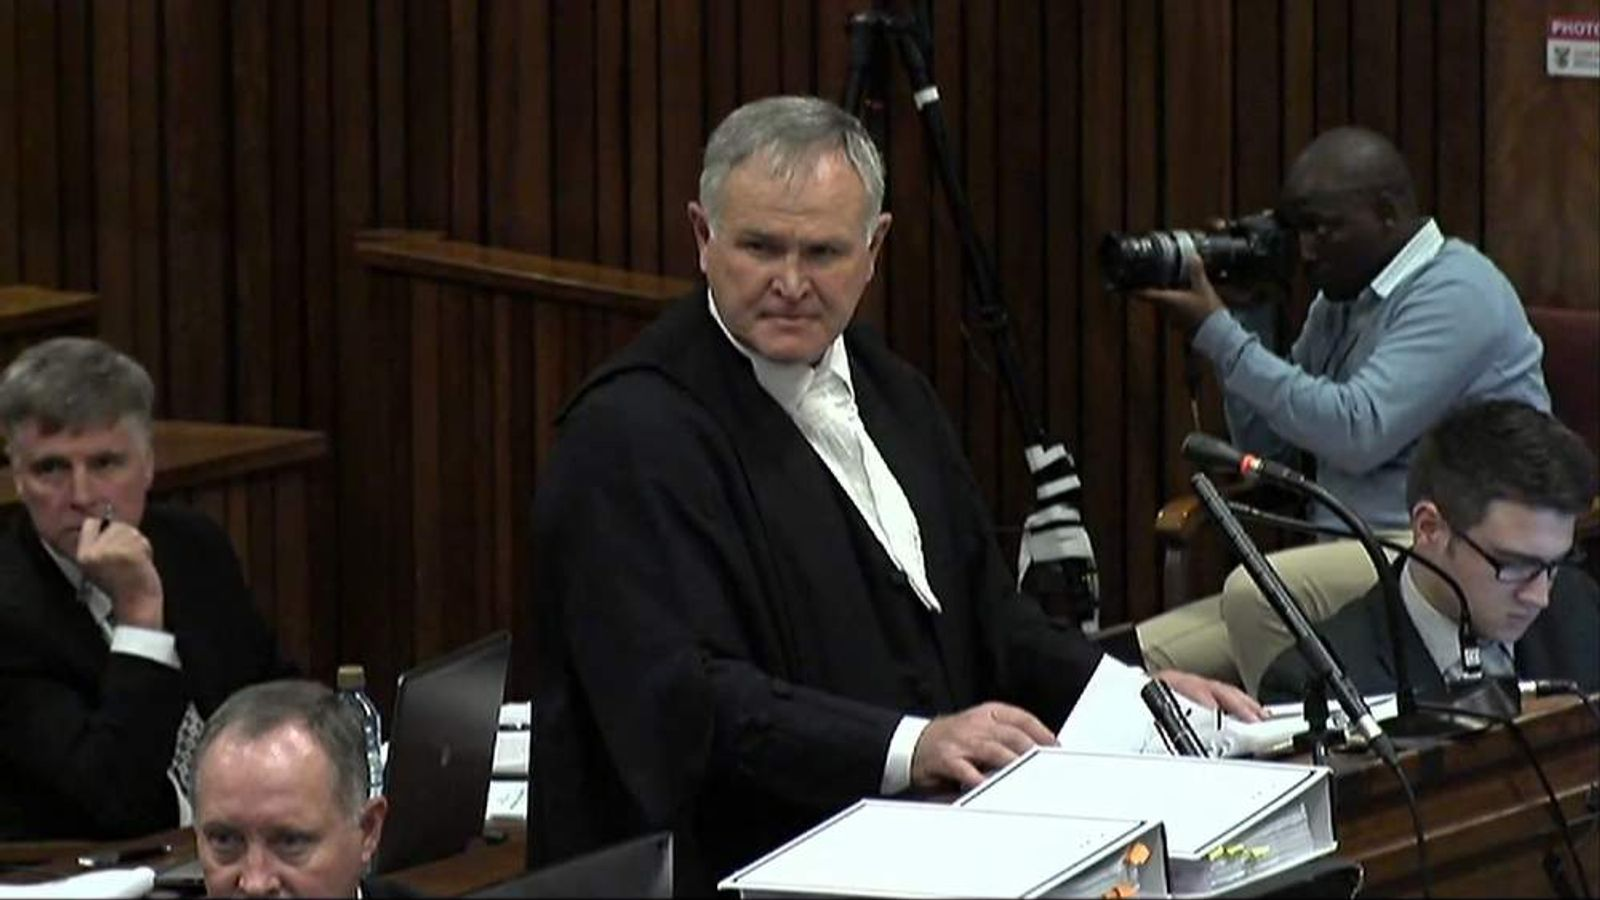 Oscar Pistorius describes moment he grabbed gun from beneath his bed